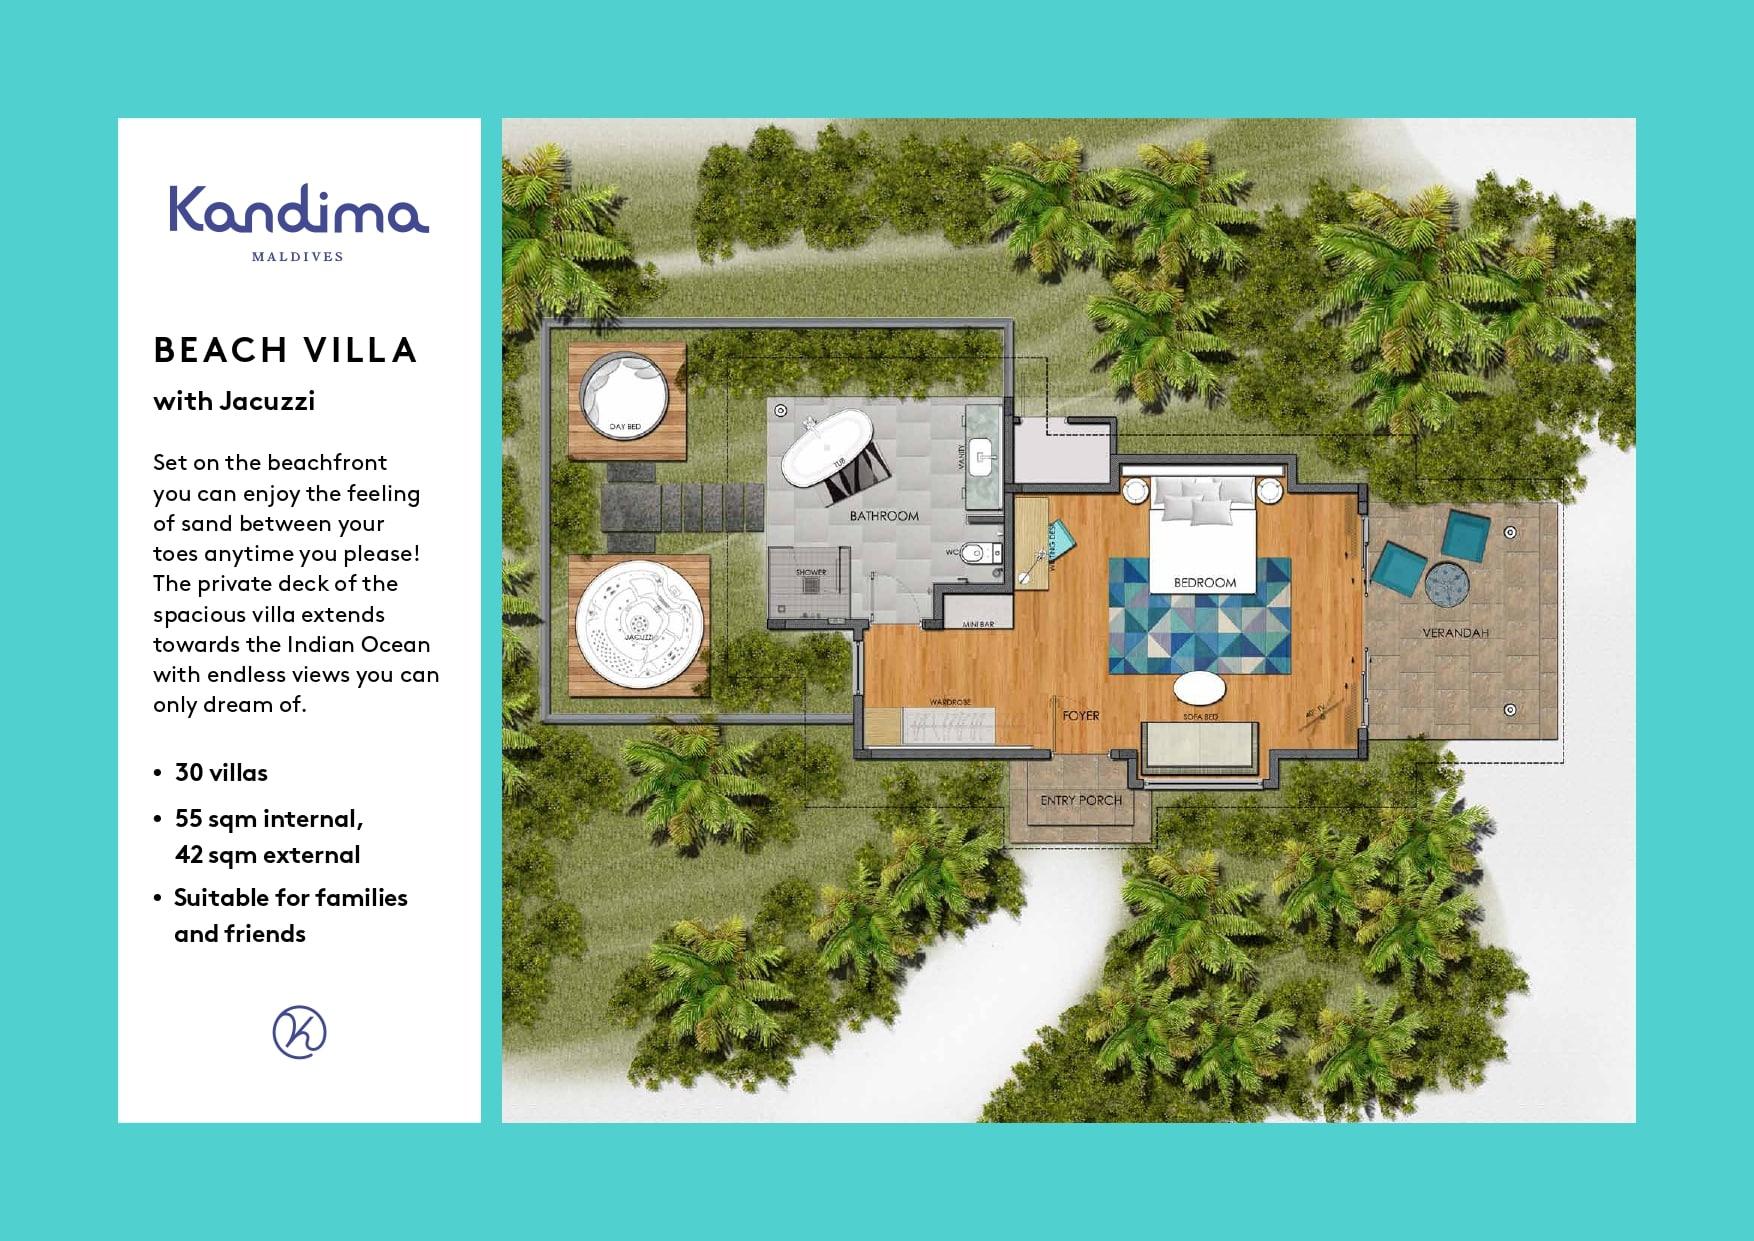 Мальдивы, отель Kandima Maldives, план-схема номера Beach Villa with Jacuzzi